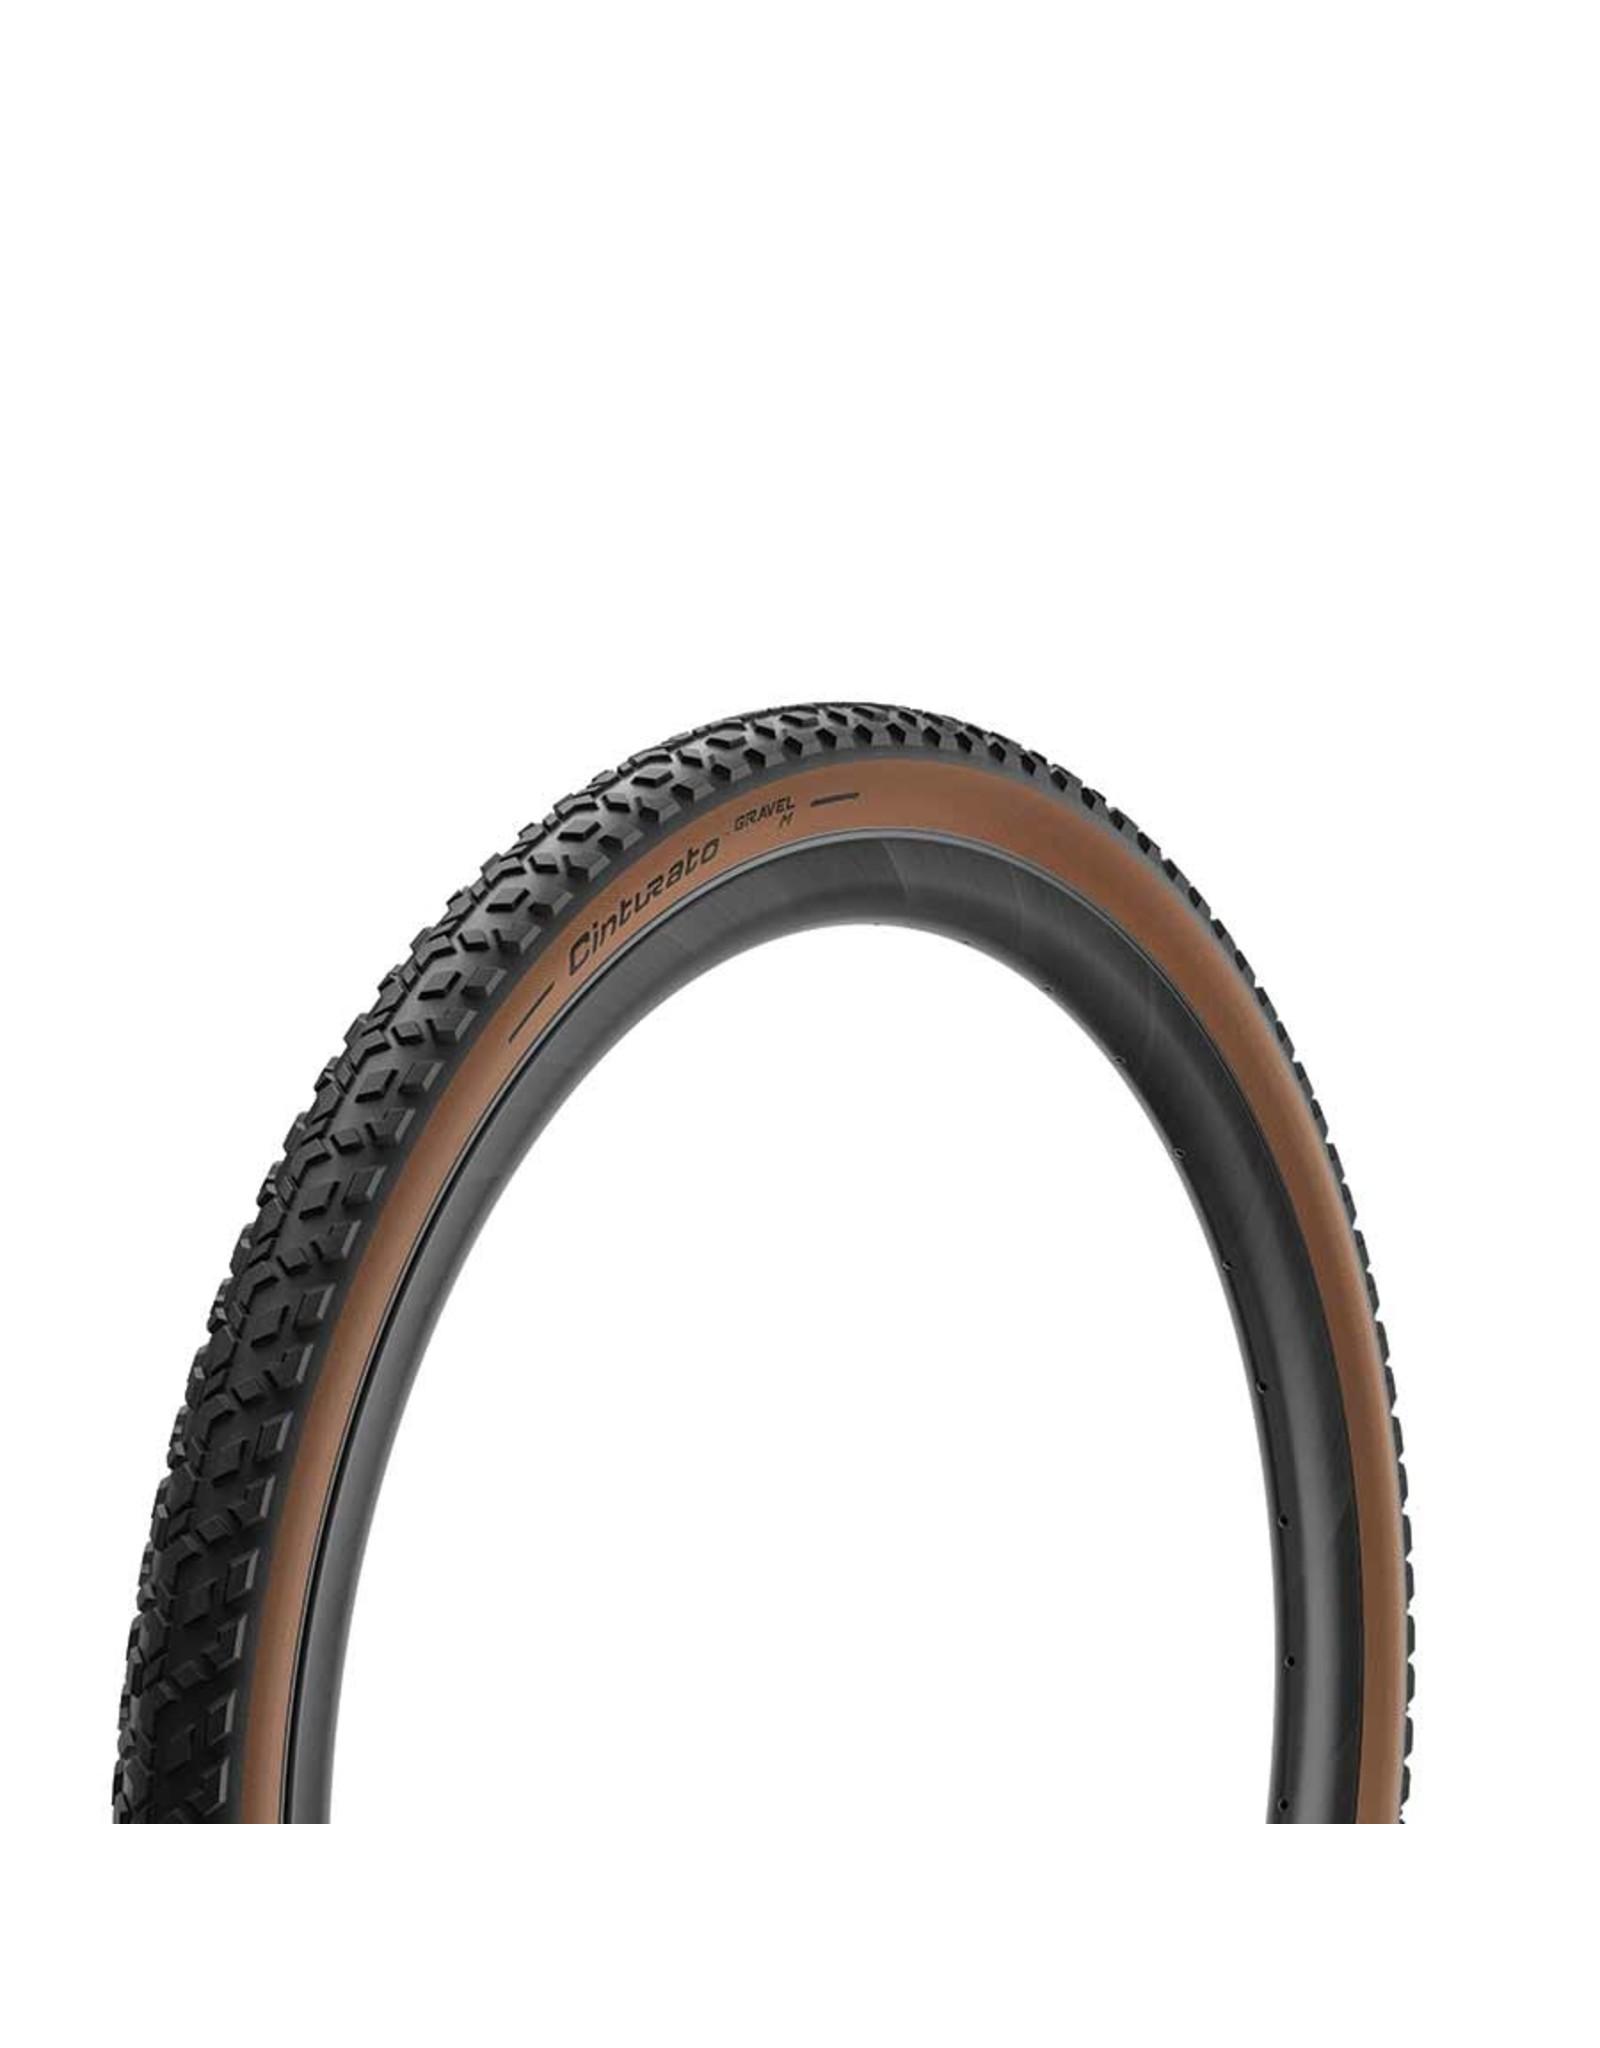 Pirelli, Cinturato Gravel M, Tire, 700x35C, Folding, Tubeless Ready, SpeedGrip, 127TPI, Beige